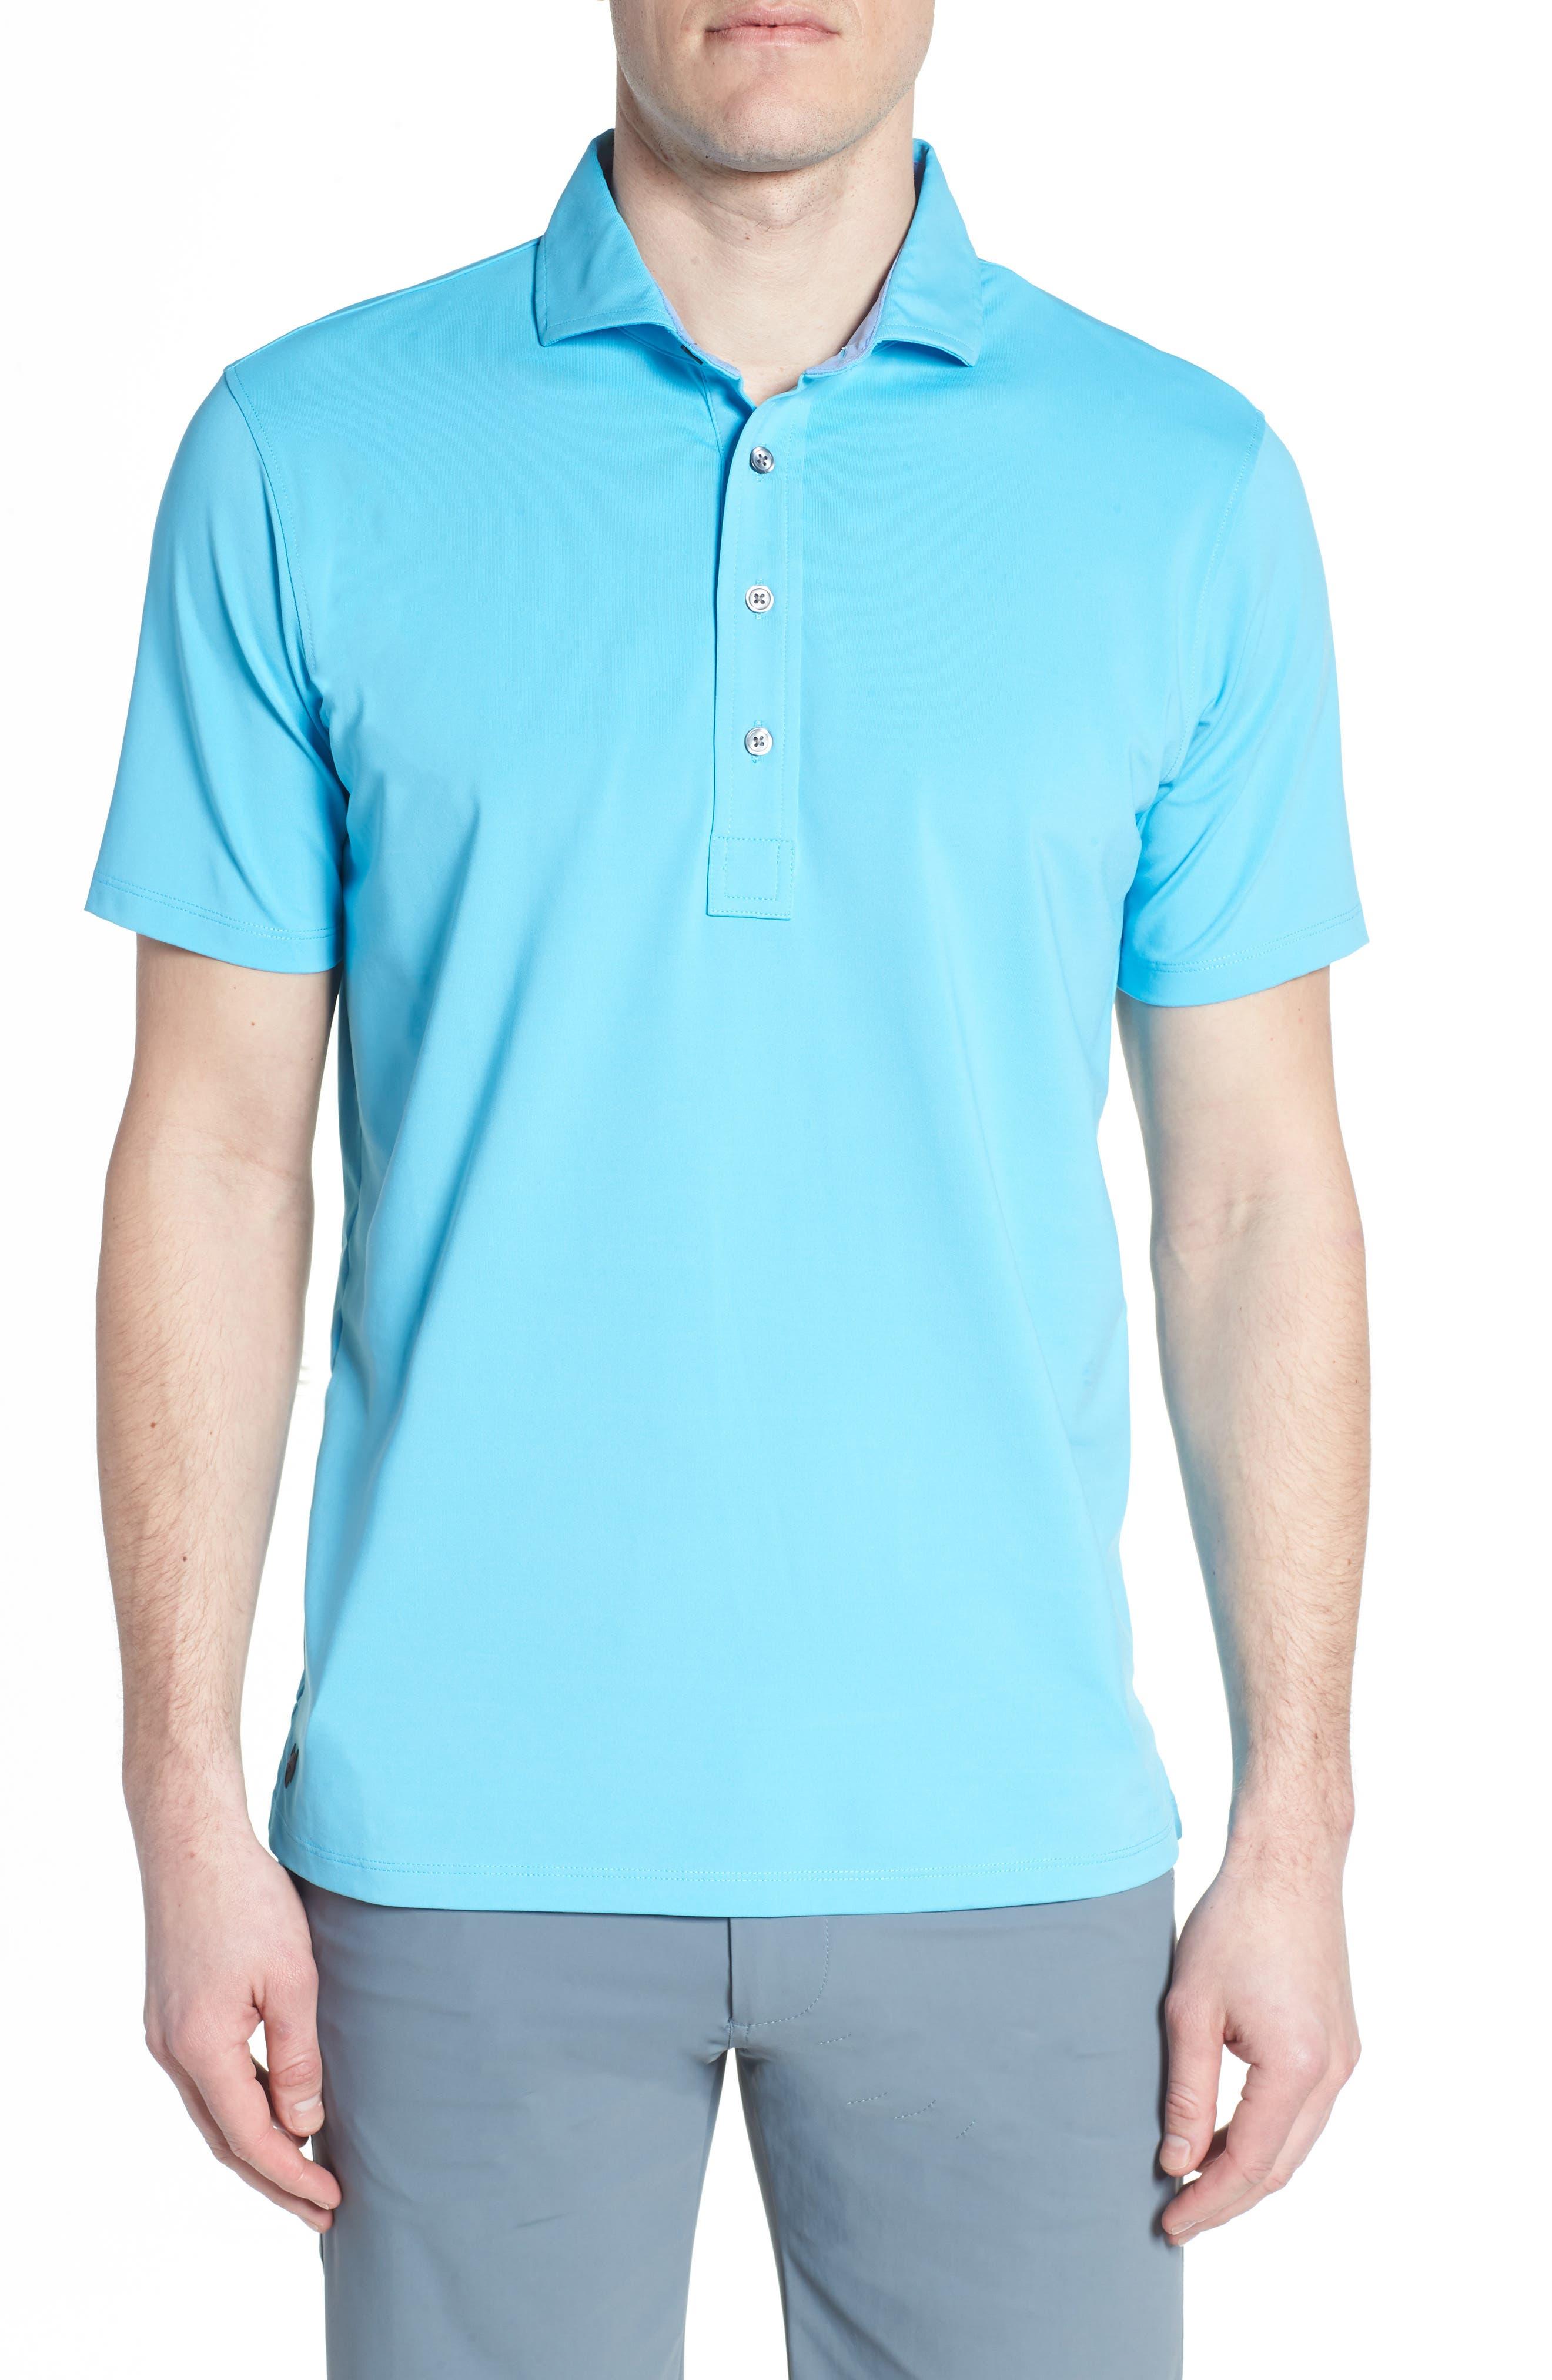 Tala Airflow Jersey Polo,                         Main,                         color, BARRACUDA